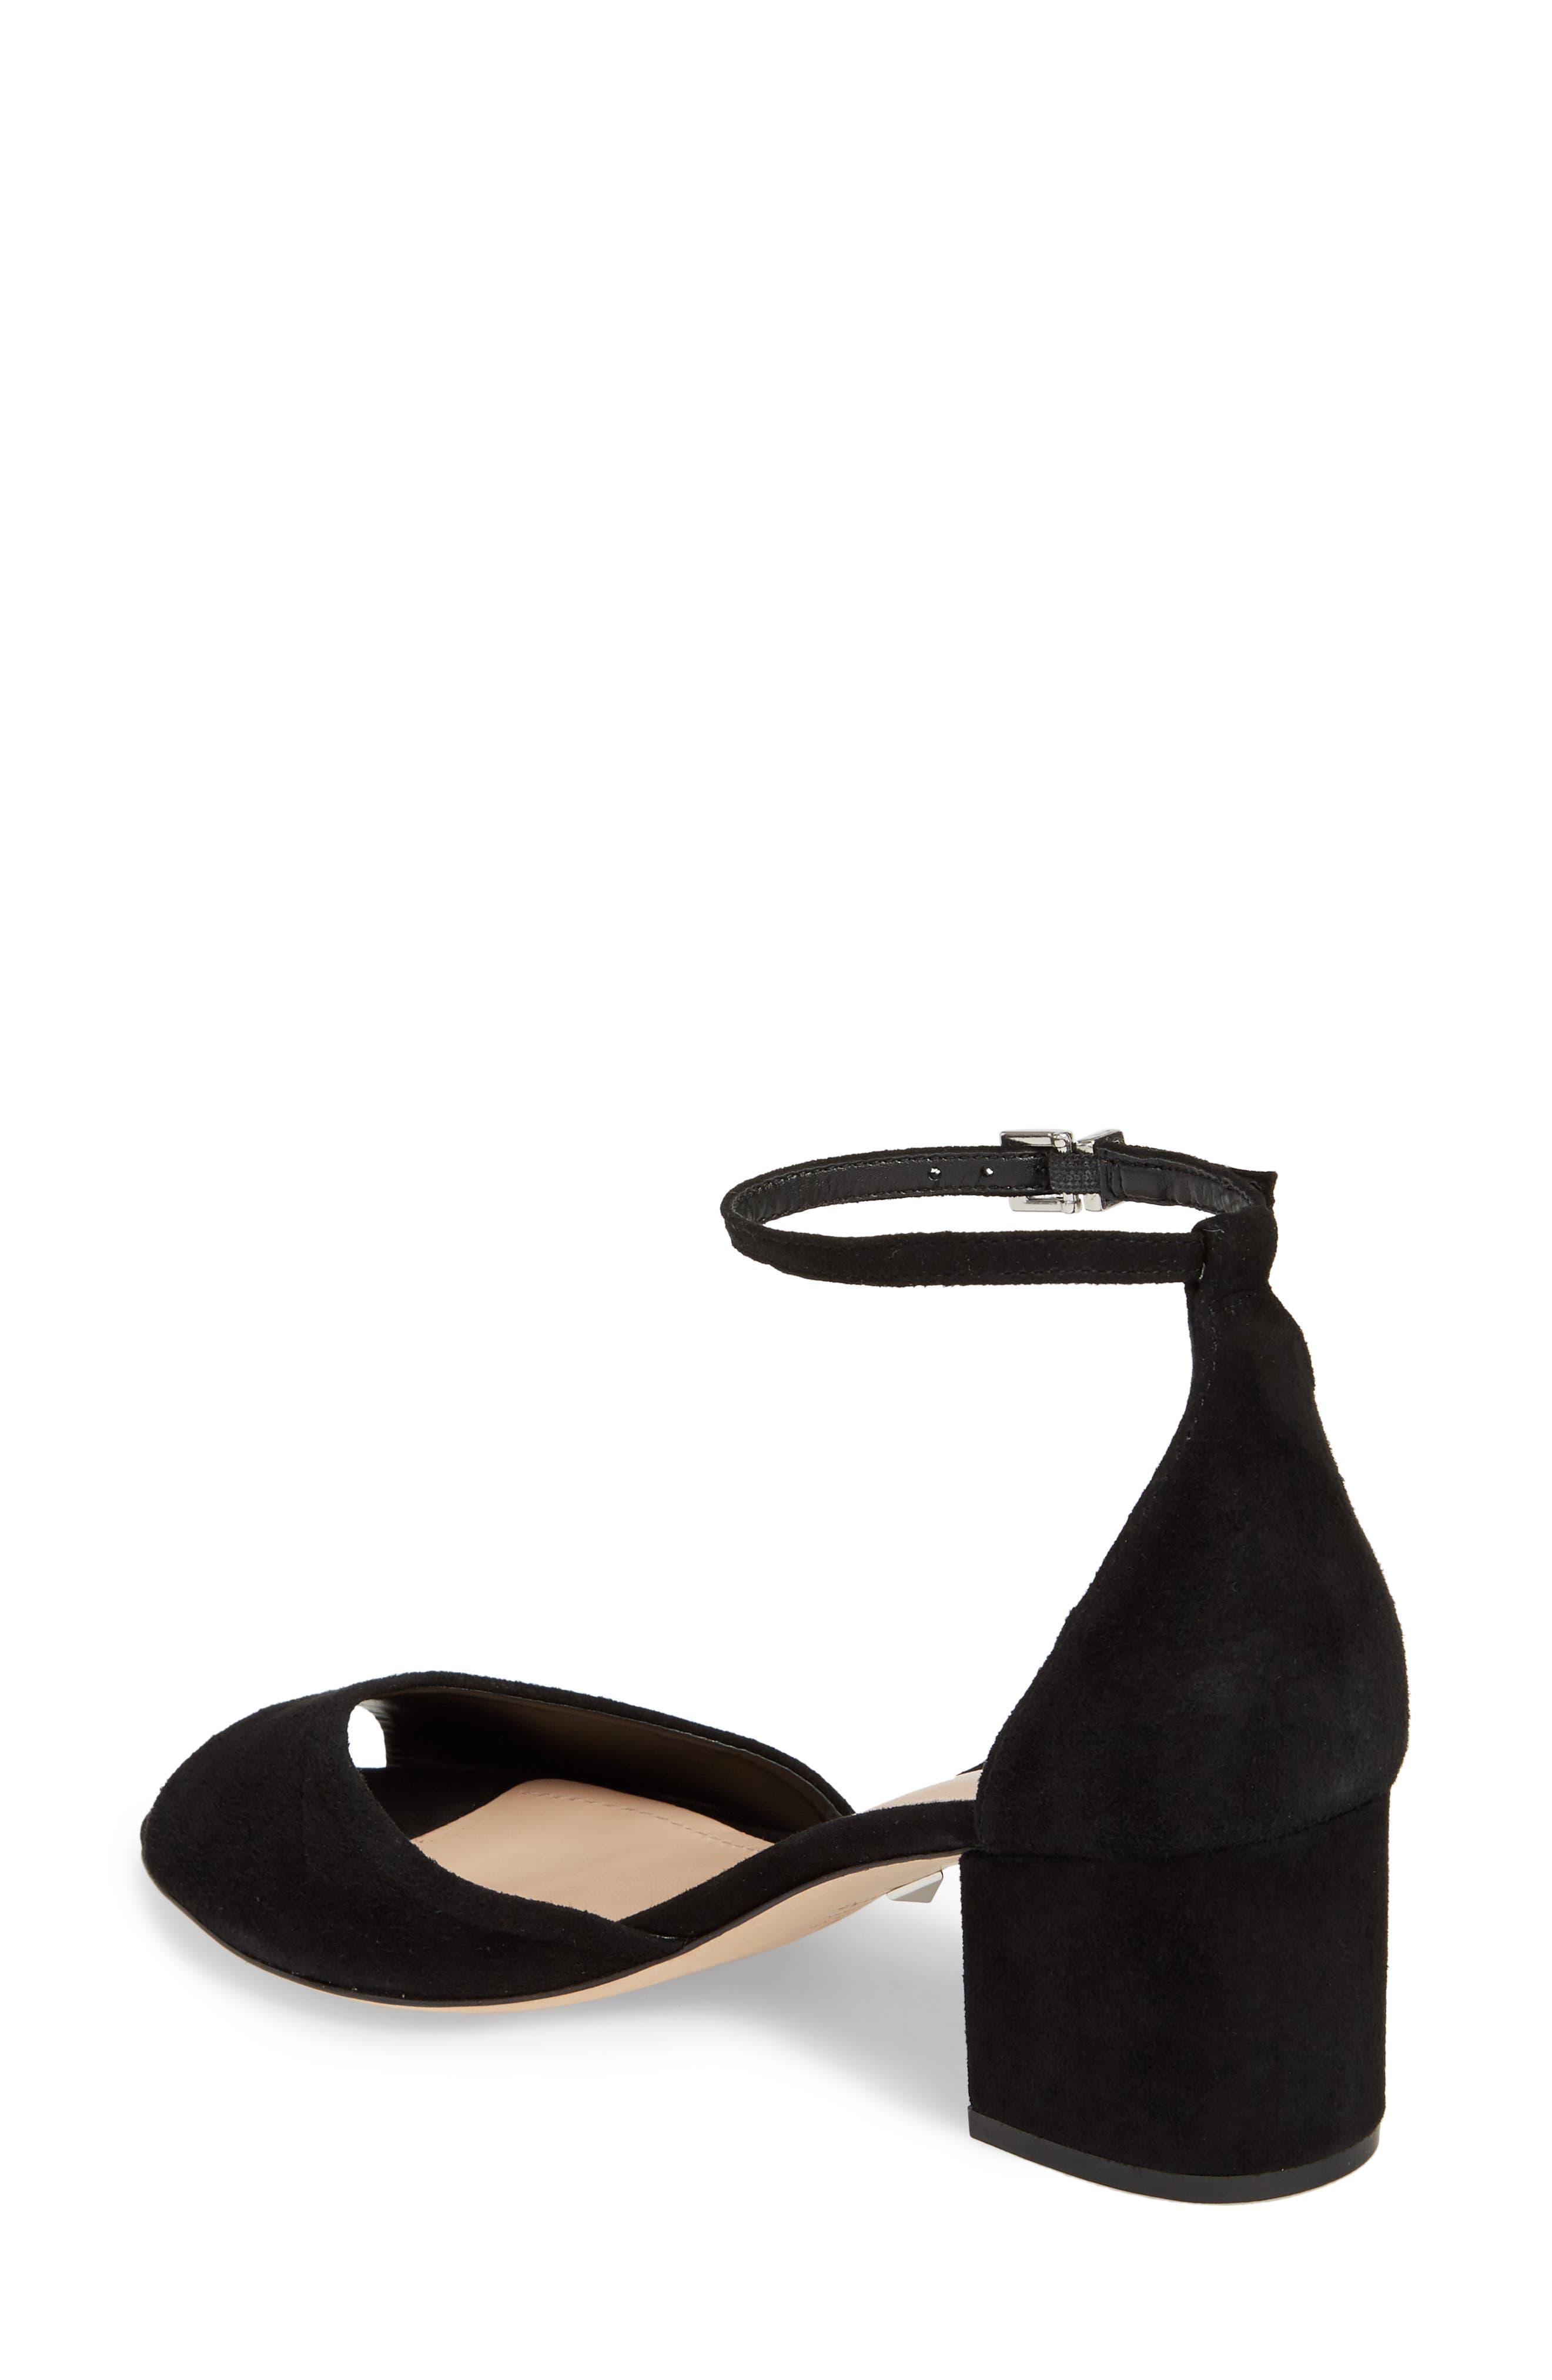 Roama Block Heel Sandal,                             Alternate thumbnail 2, color,                             Black Suede